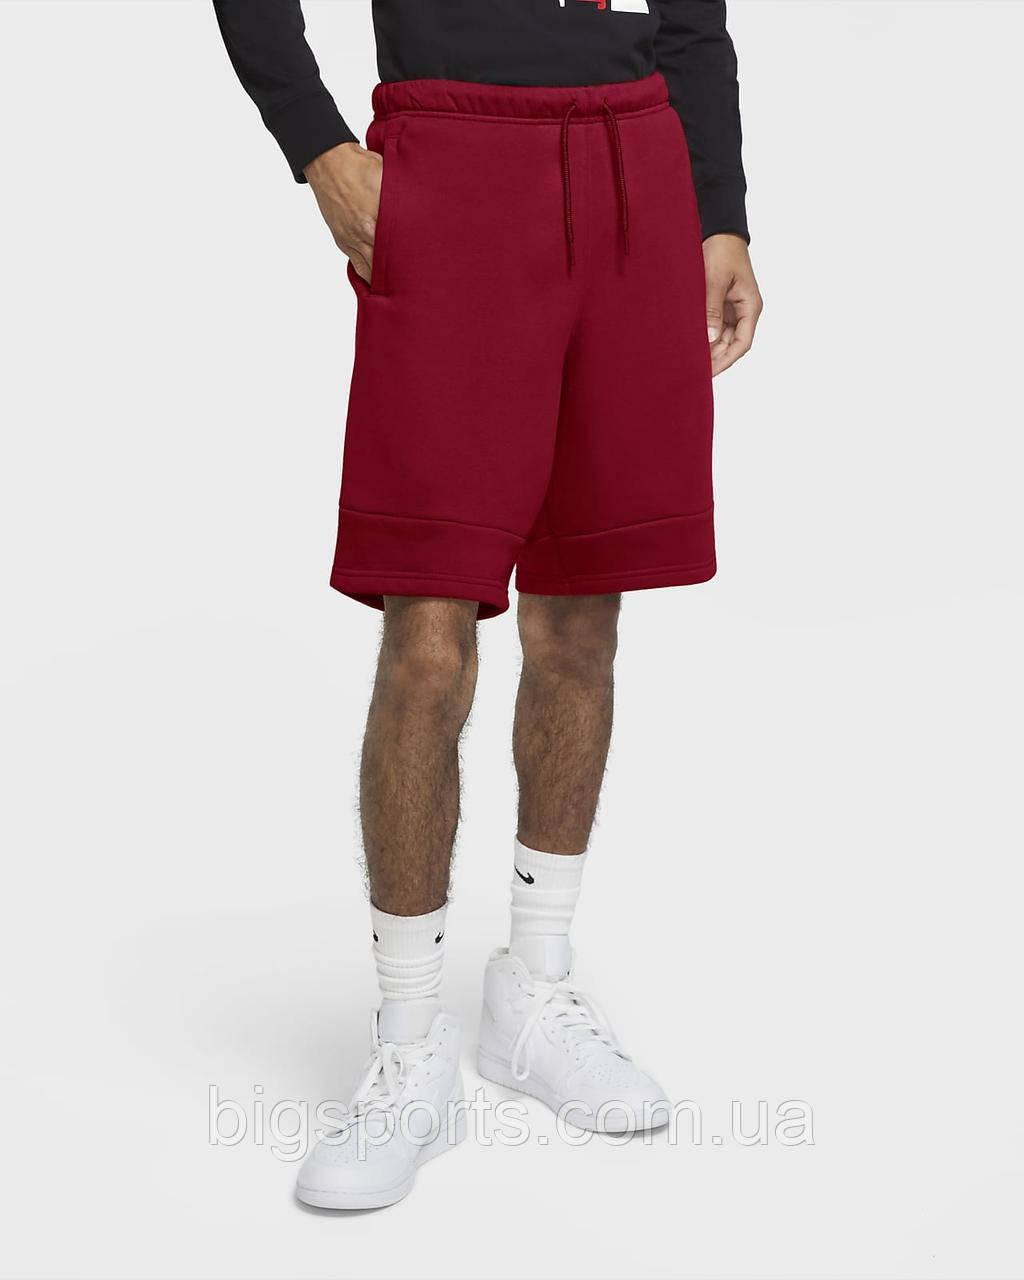 Шорты муж. Nike Jumpman Air Men's Fleece Shorts 'Red' (арт. CK6707-687)